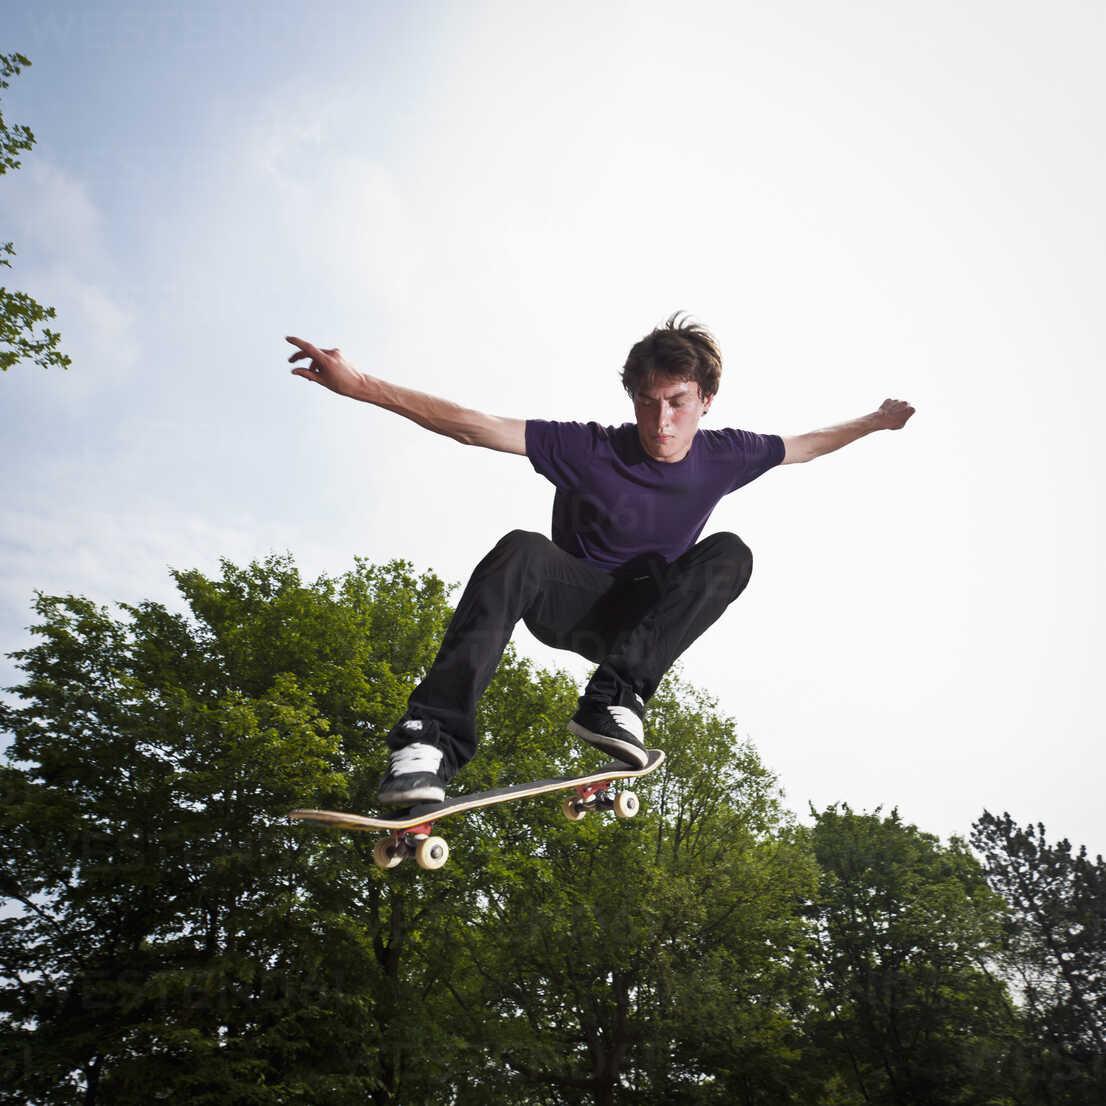 Germany, NRW, Duesseldorf, Man skateboarding at public skatepark - KJF000115 - Kai Jabs/Westend61